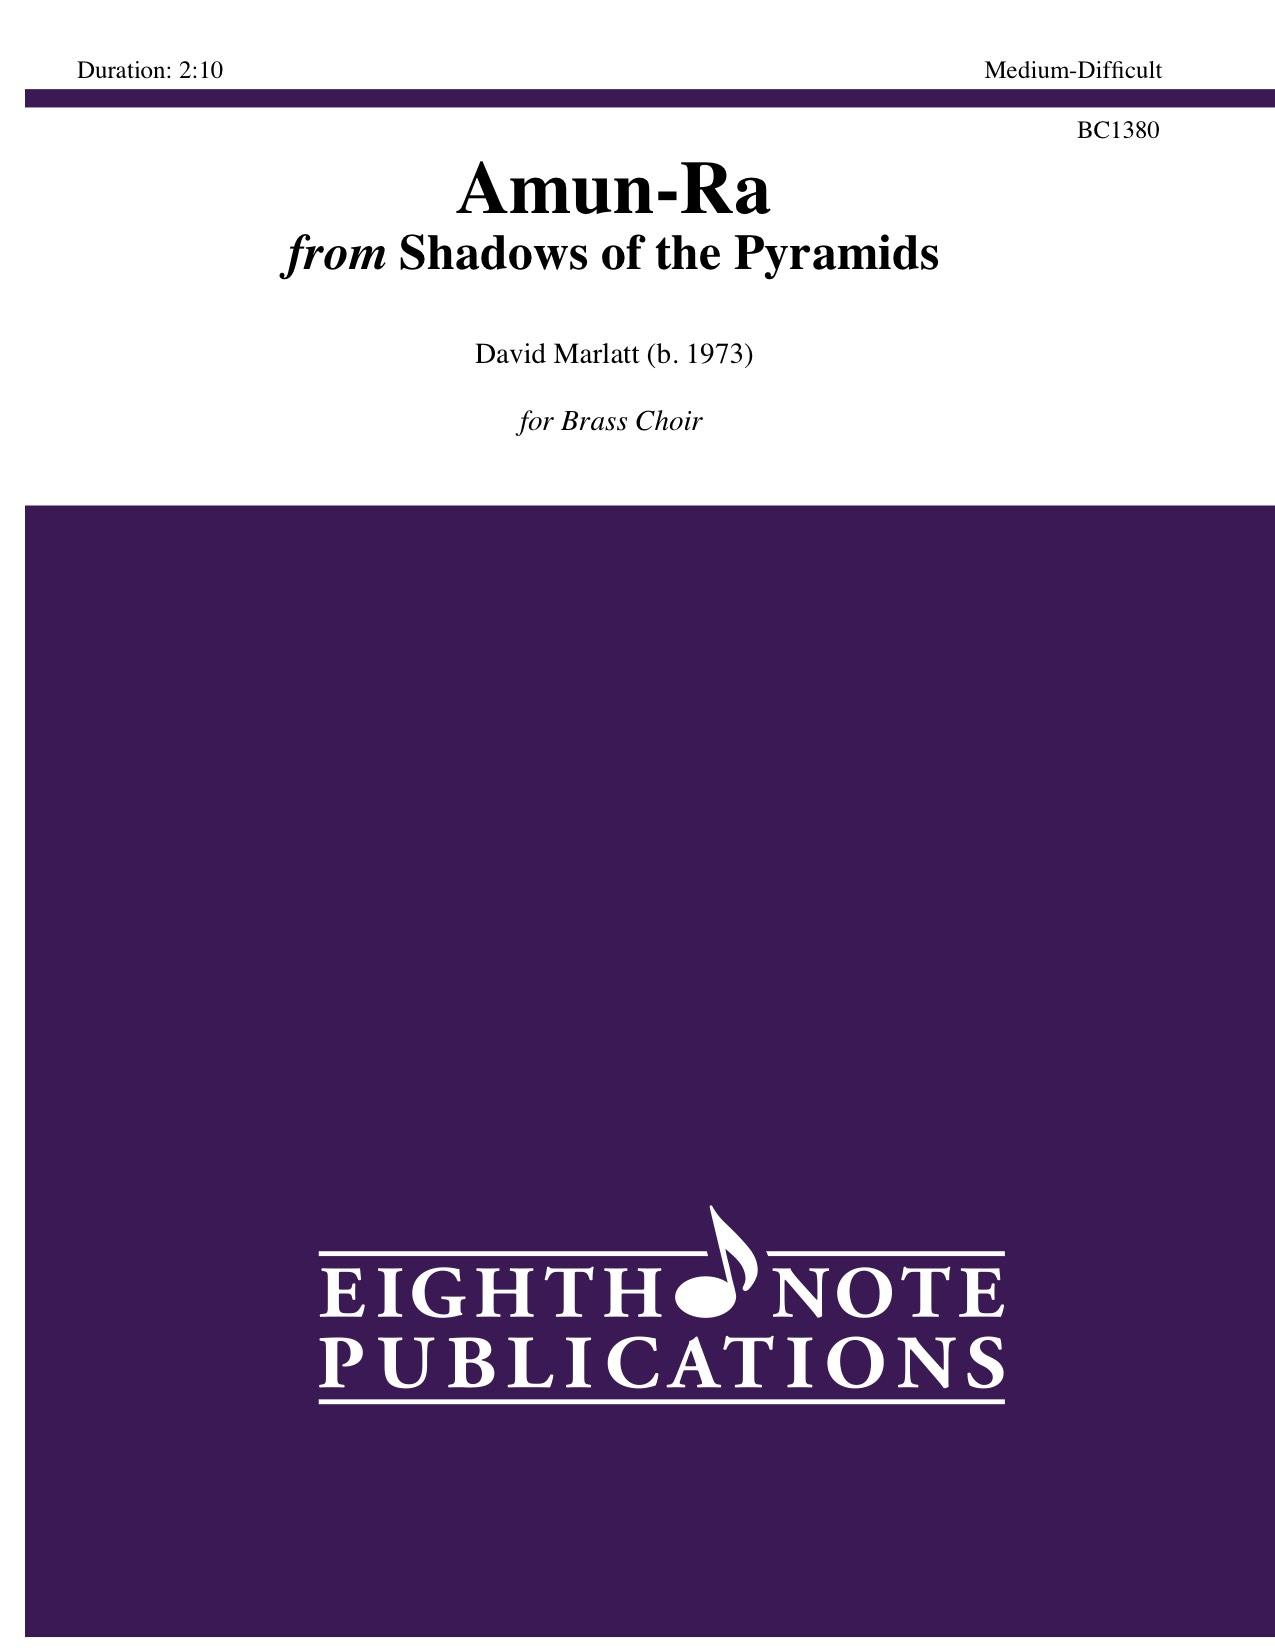 Amun-Ra from Shadows of the Pyramids - David Marlatt